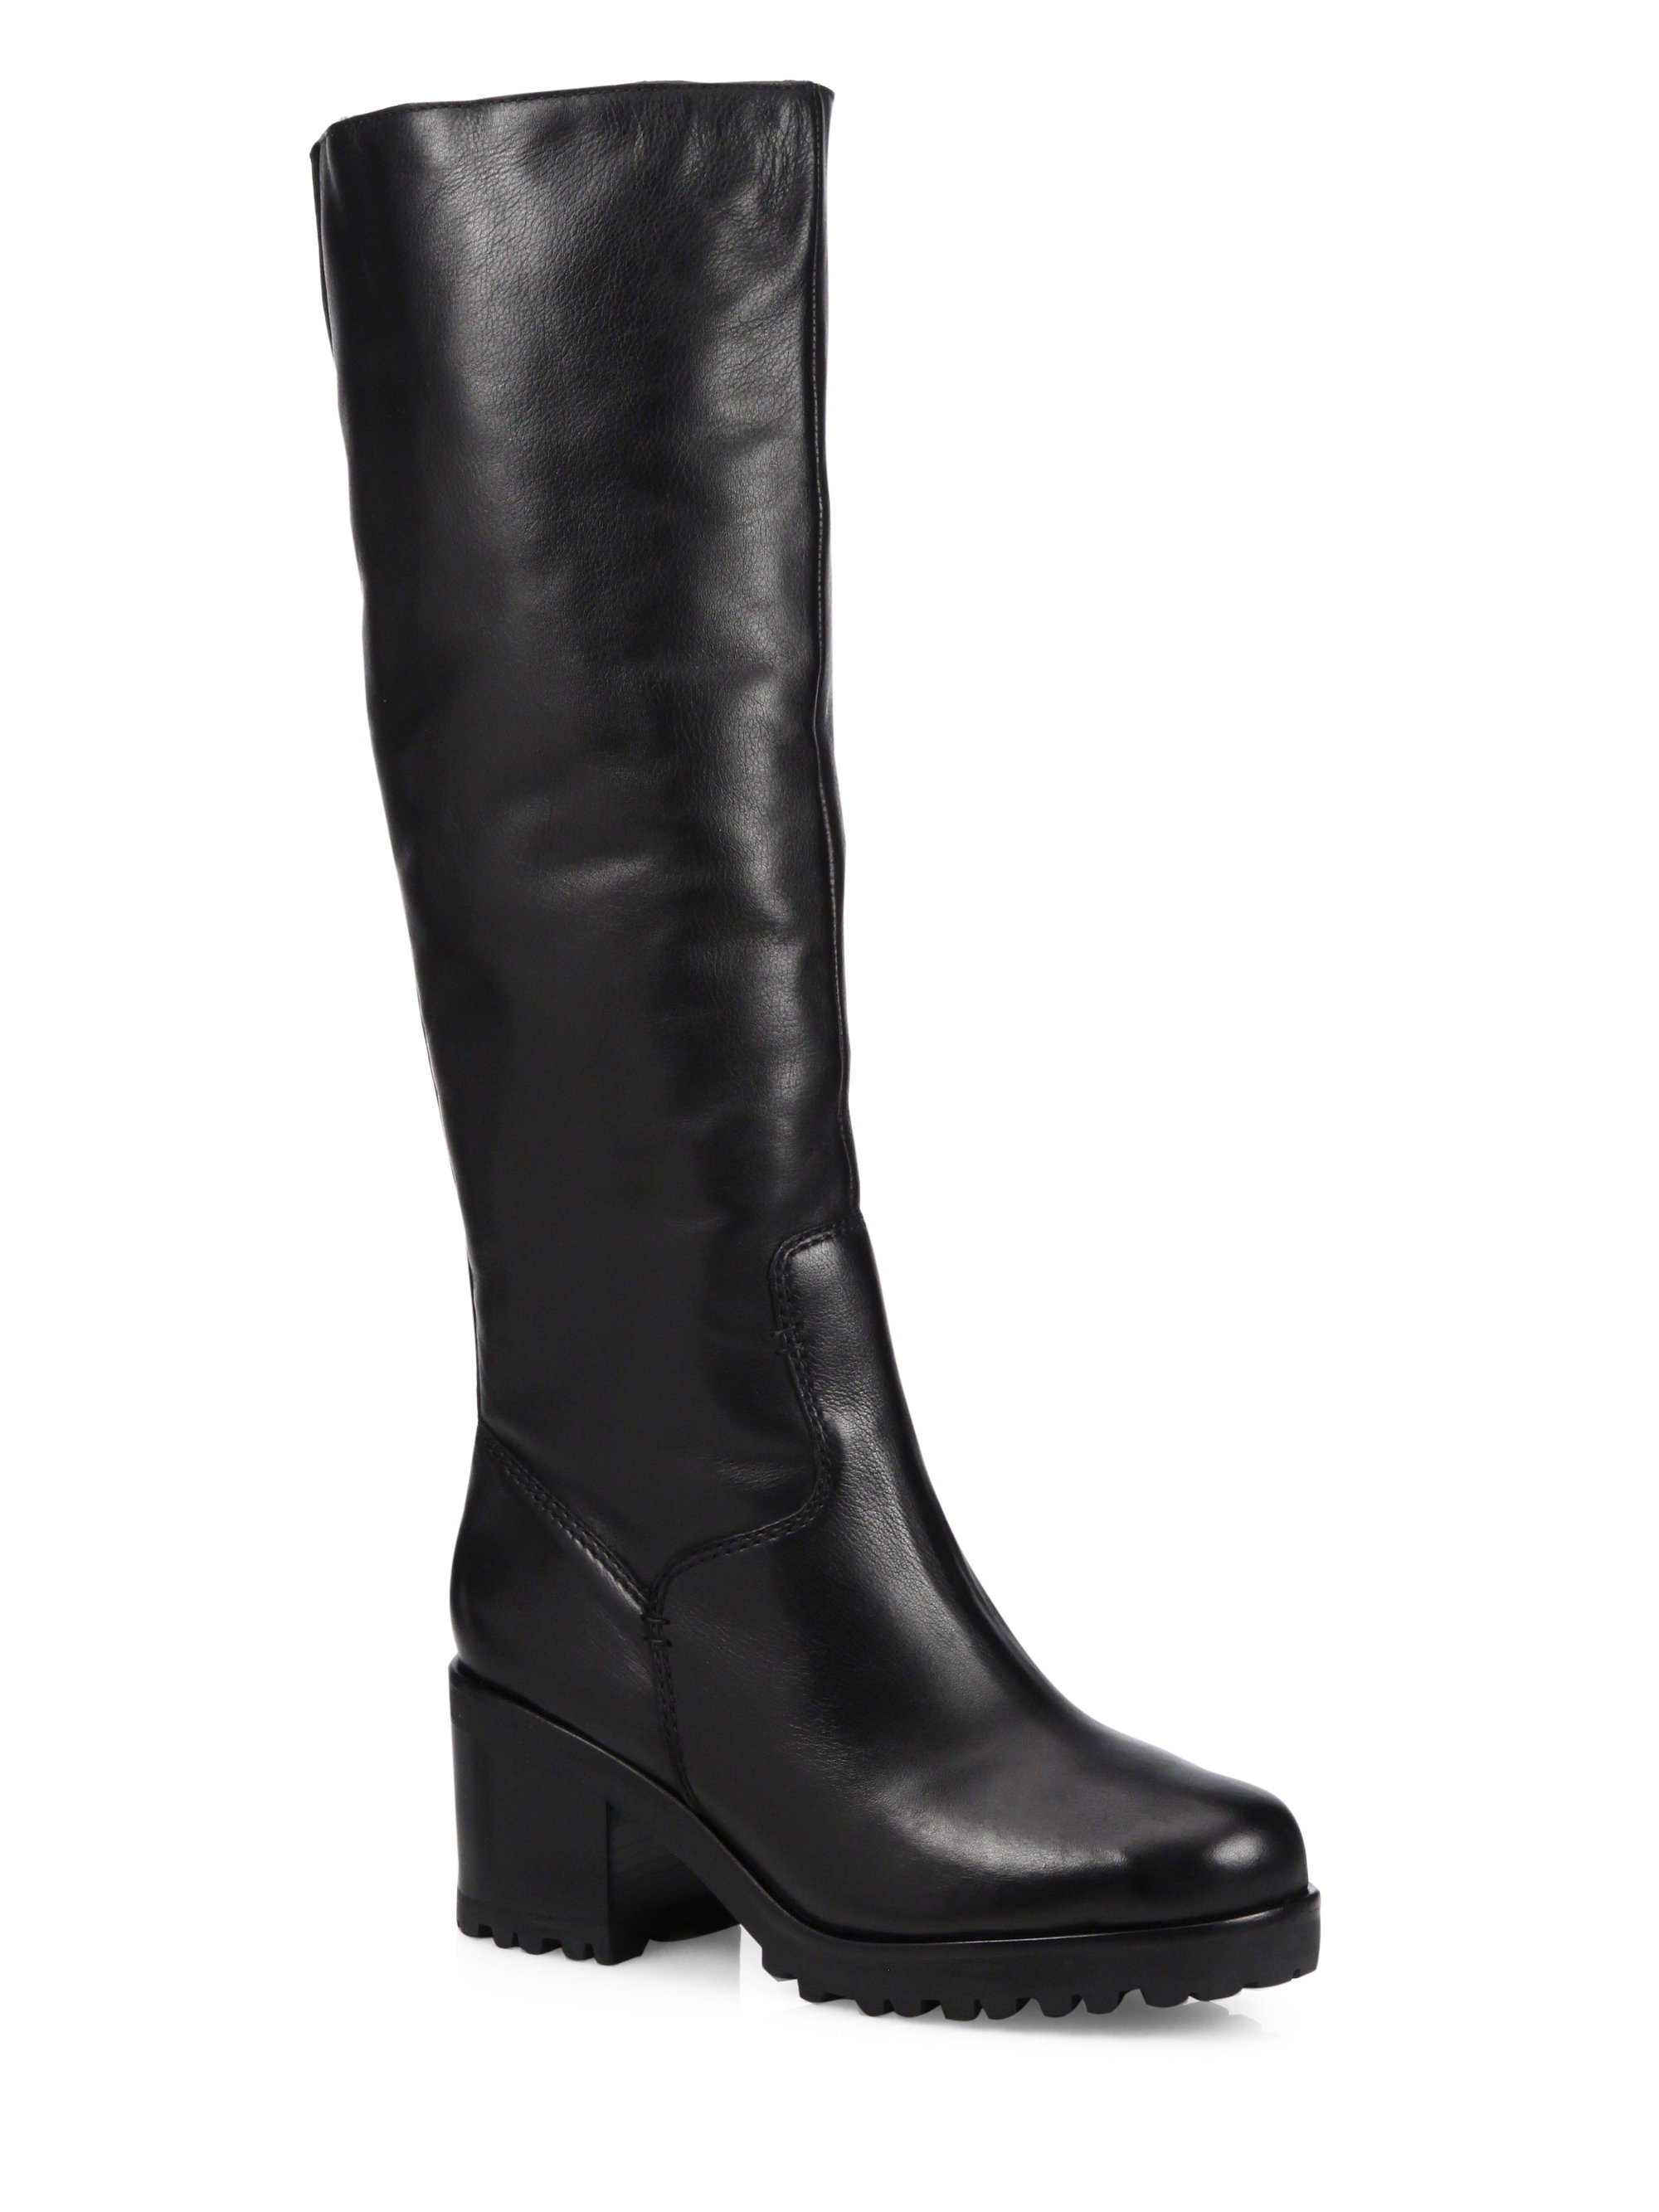 Schutz Kyara Lee Tall Leather & Faux Fur Boots in Black  Lyst